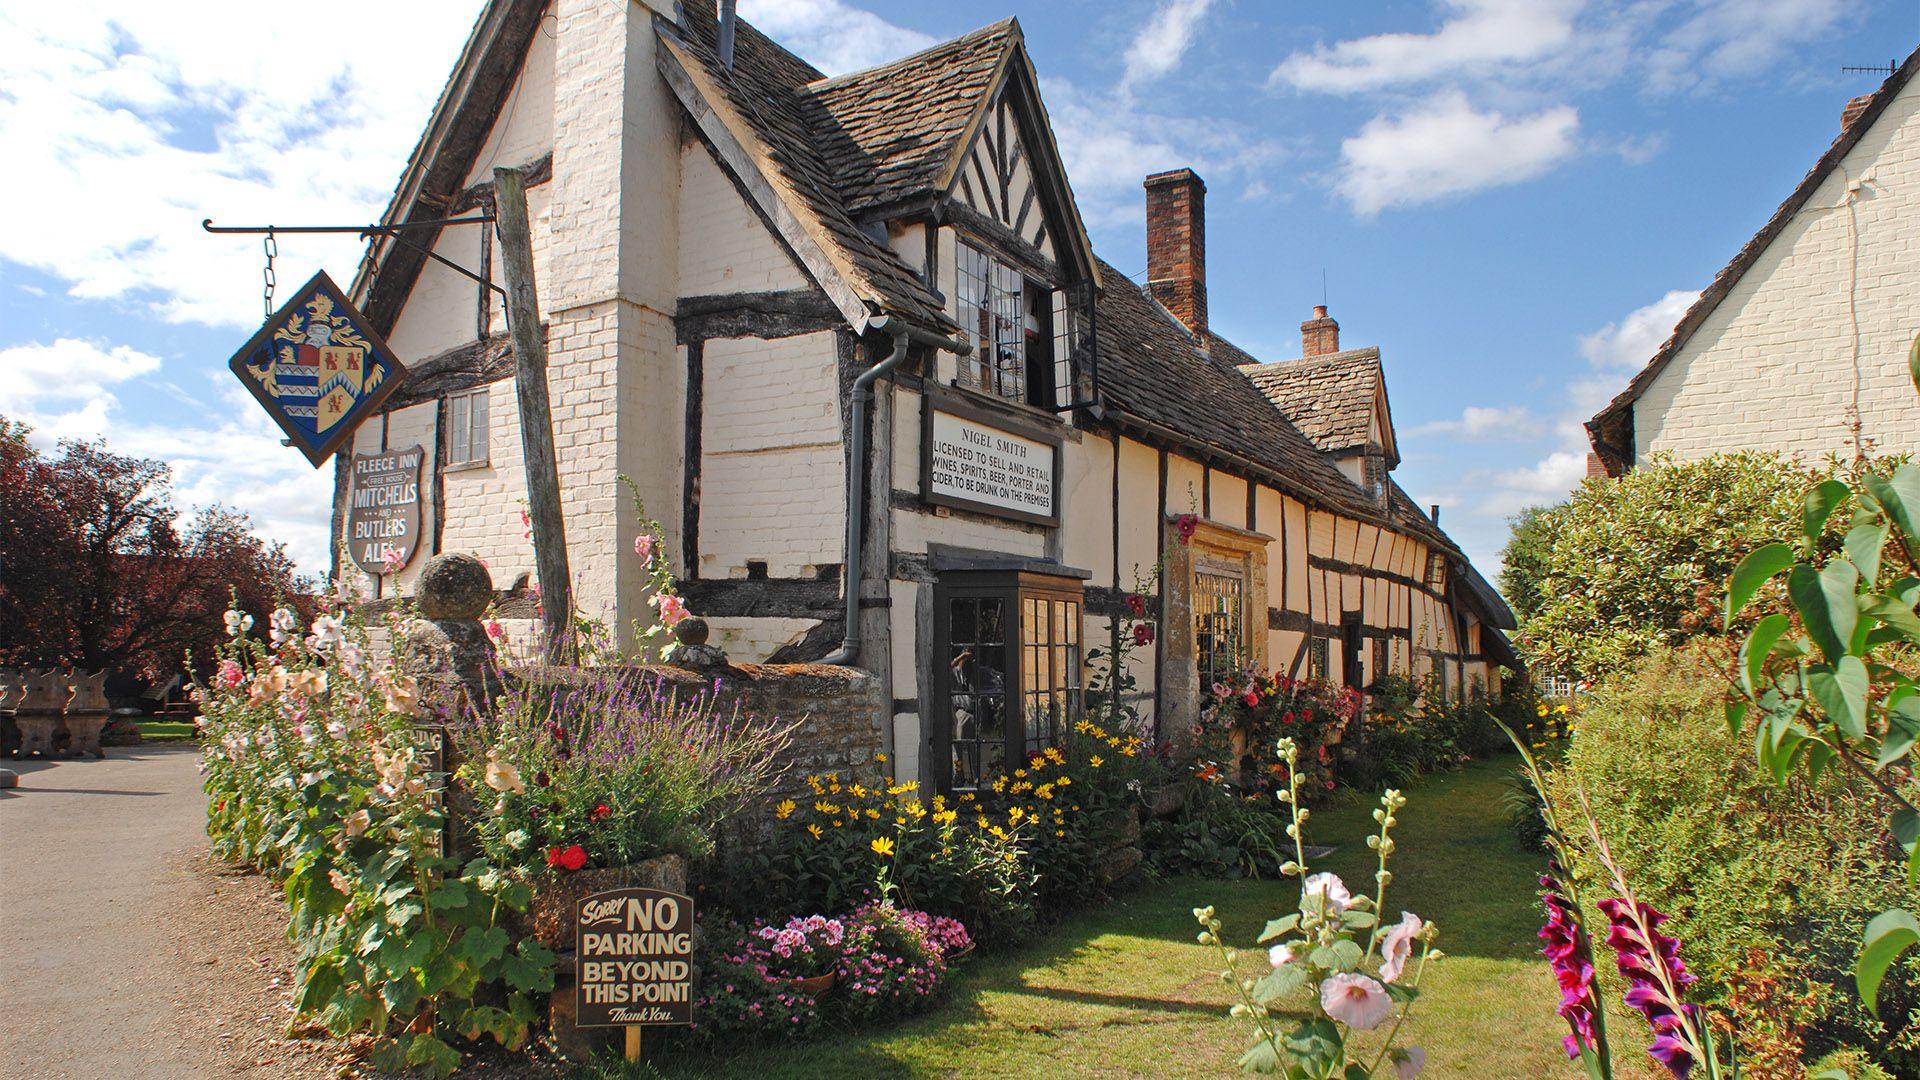 Village pub in Bretforton, Old Fox Cottage, Bolthole Retreats